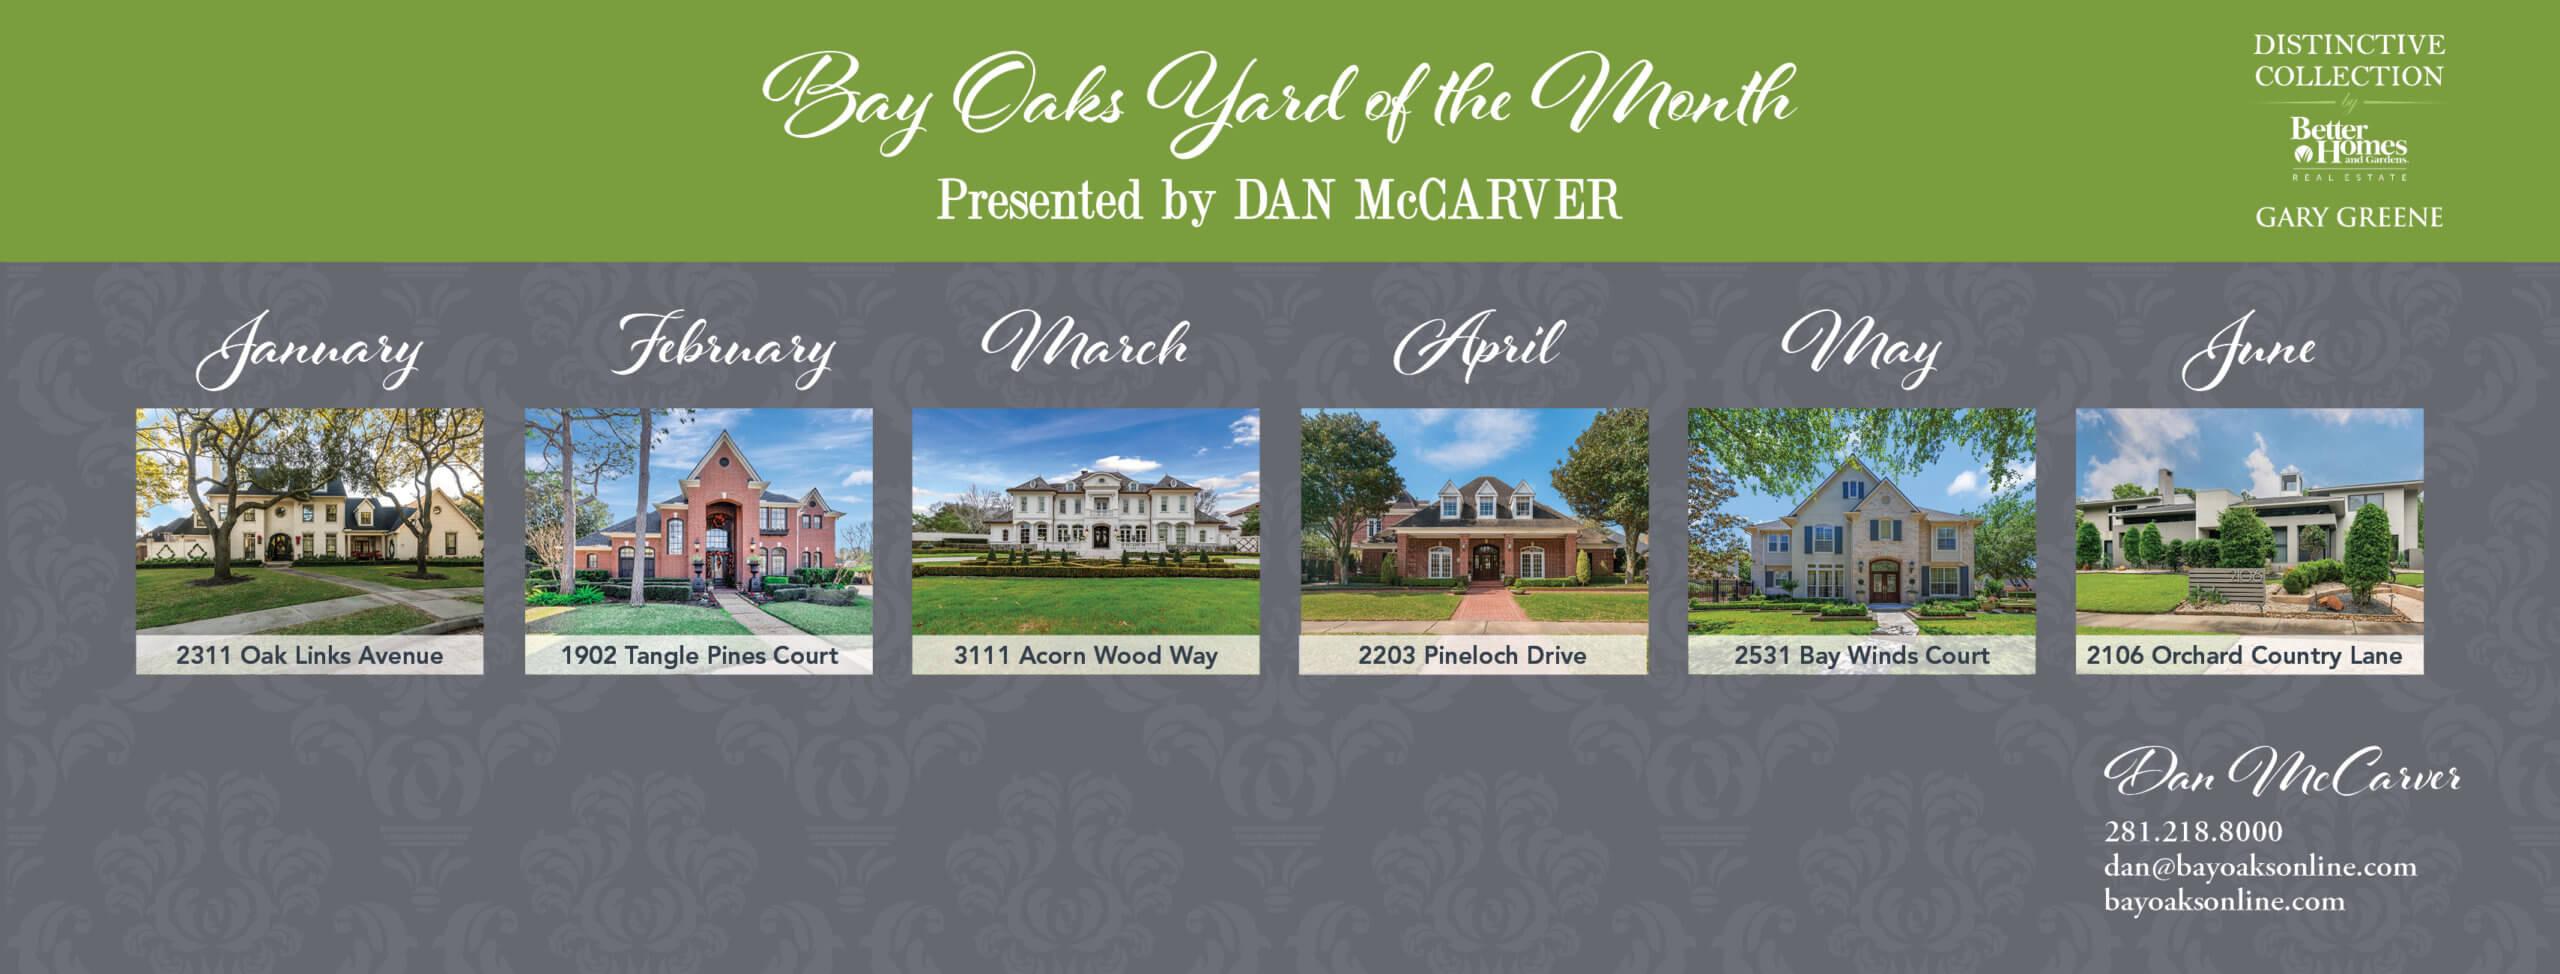 Bay Oaks Yard of the Month 2021 Presented by Dan McCarver